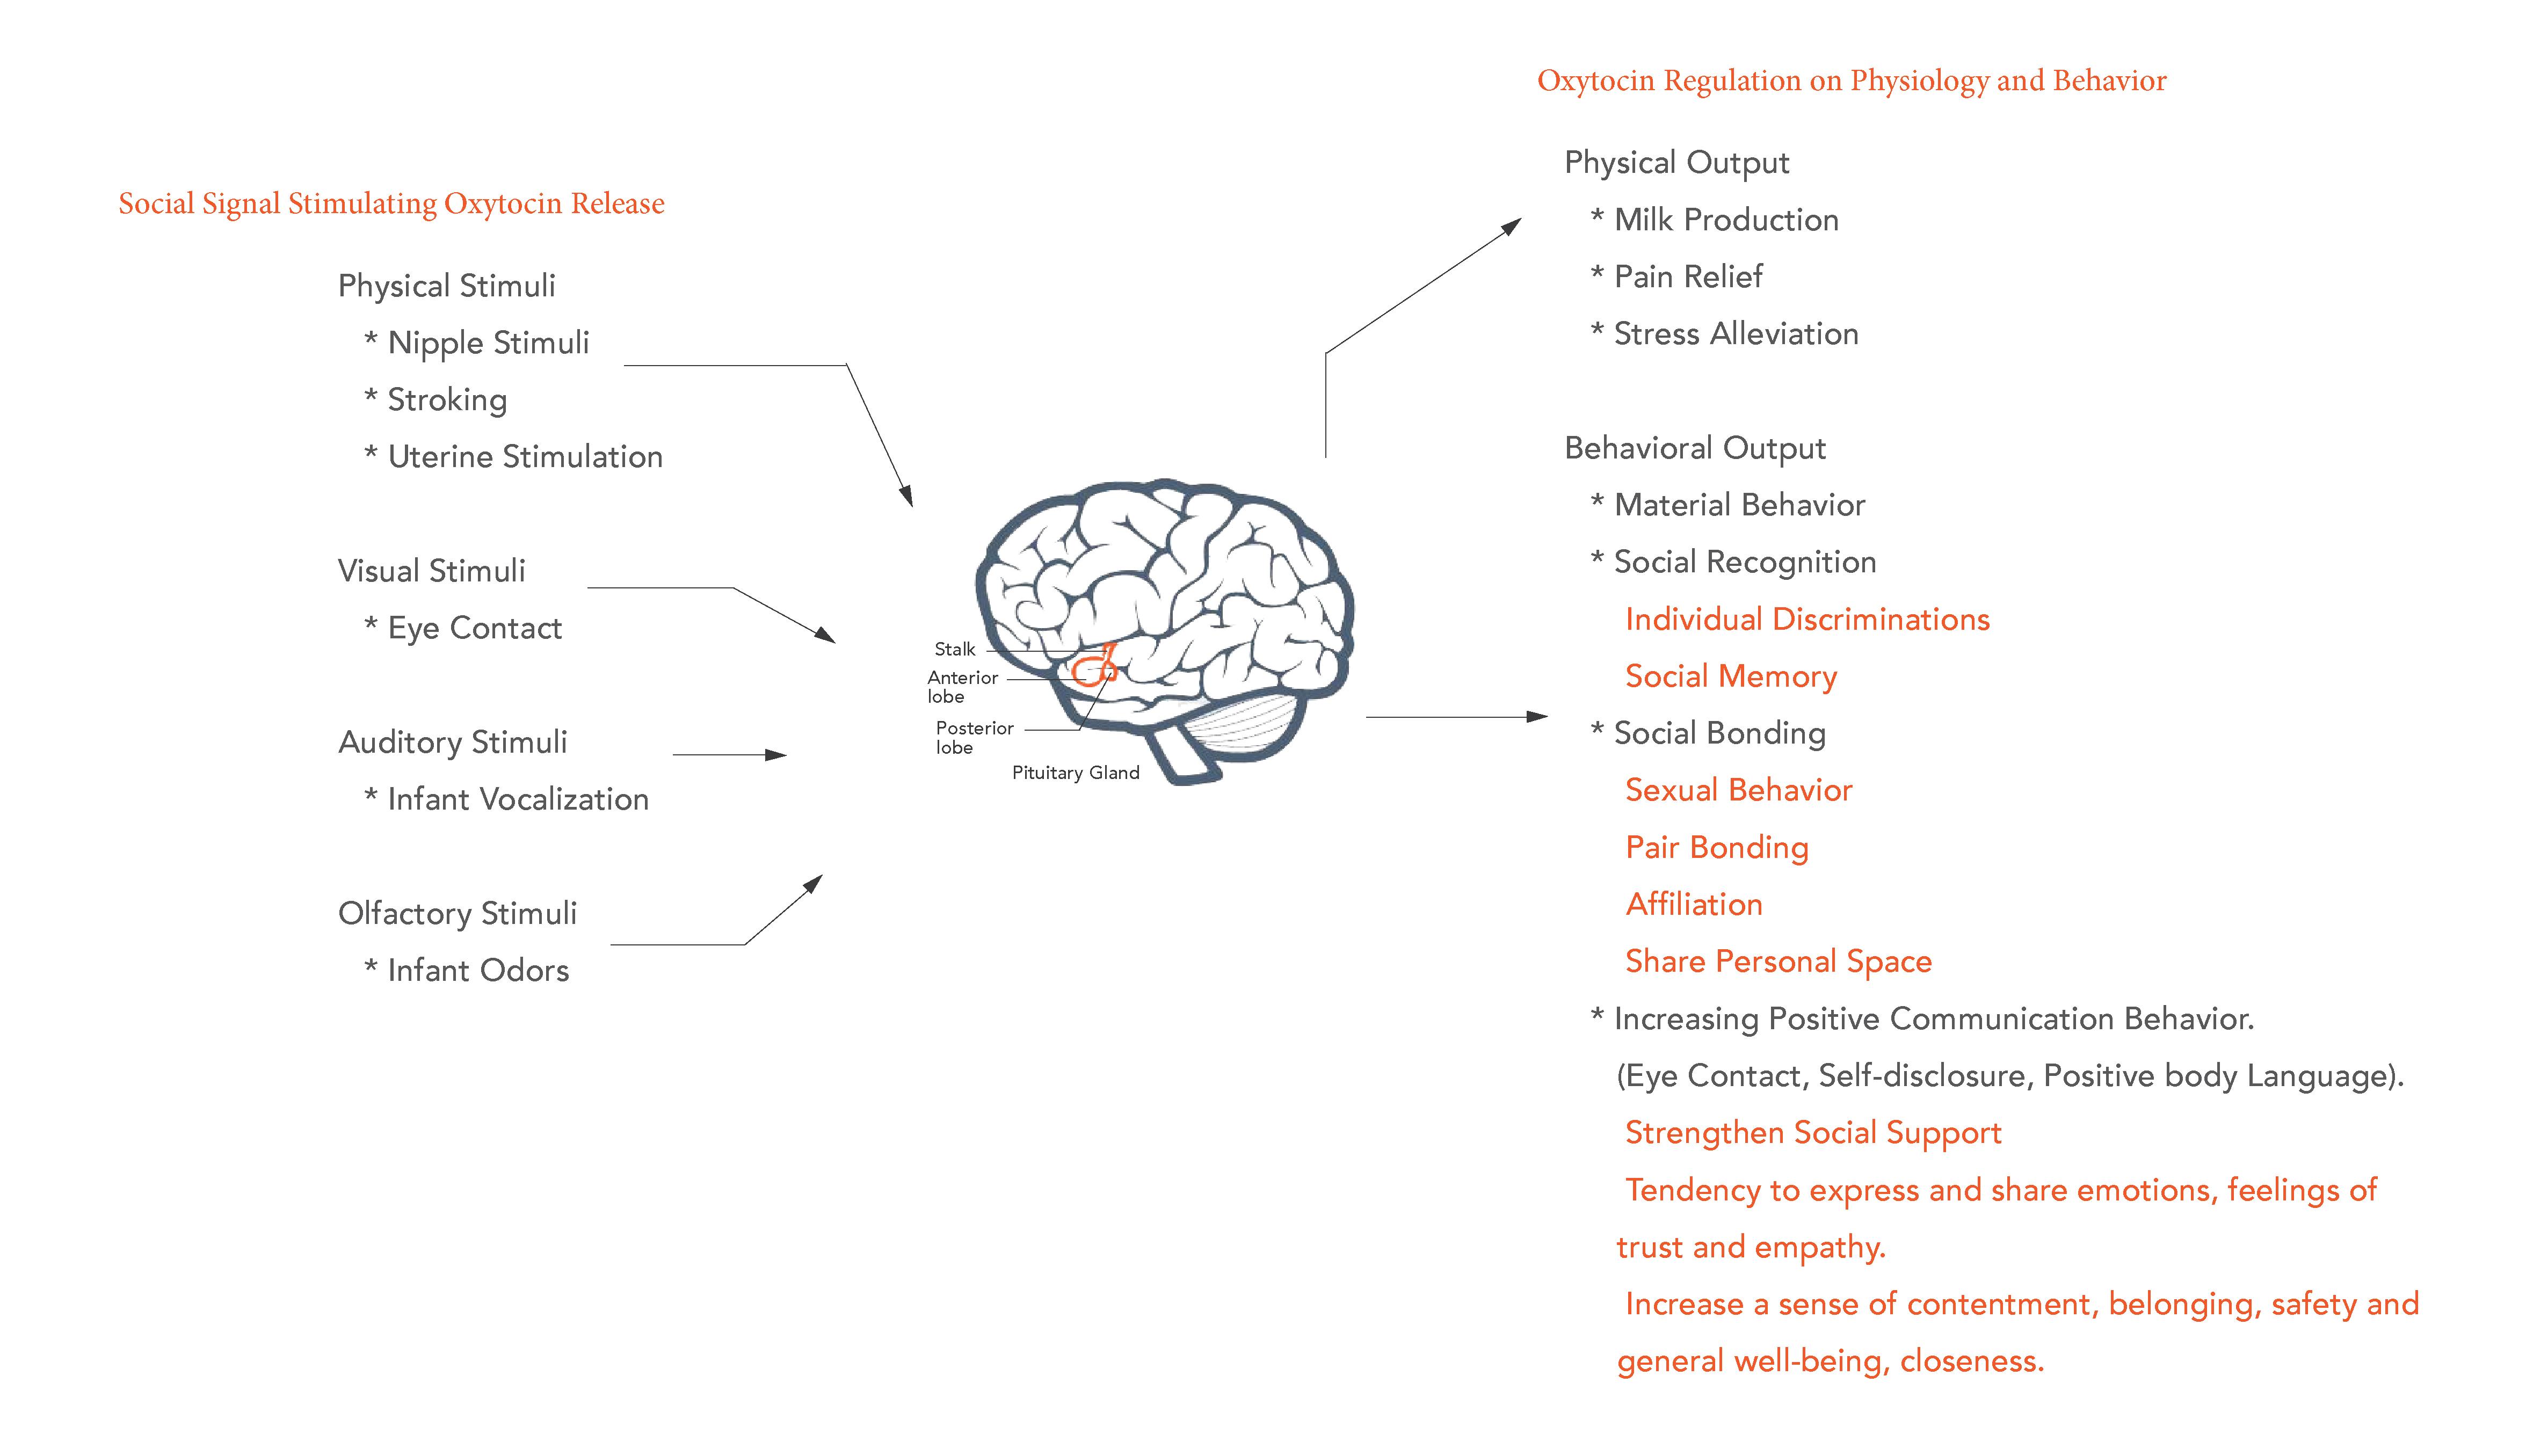 Oxytocin brain